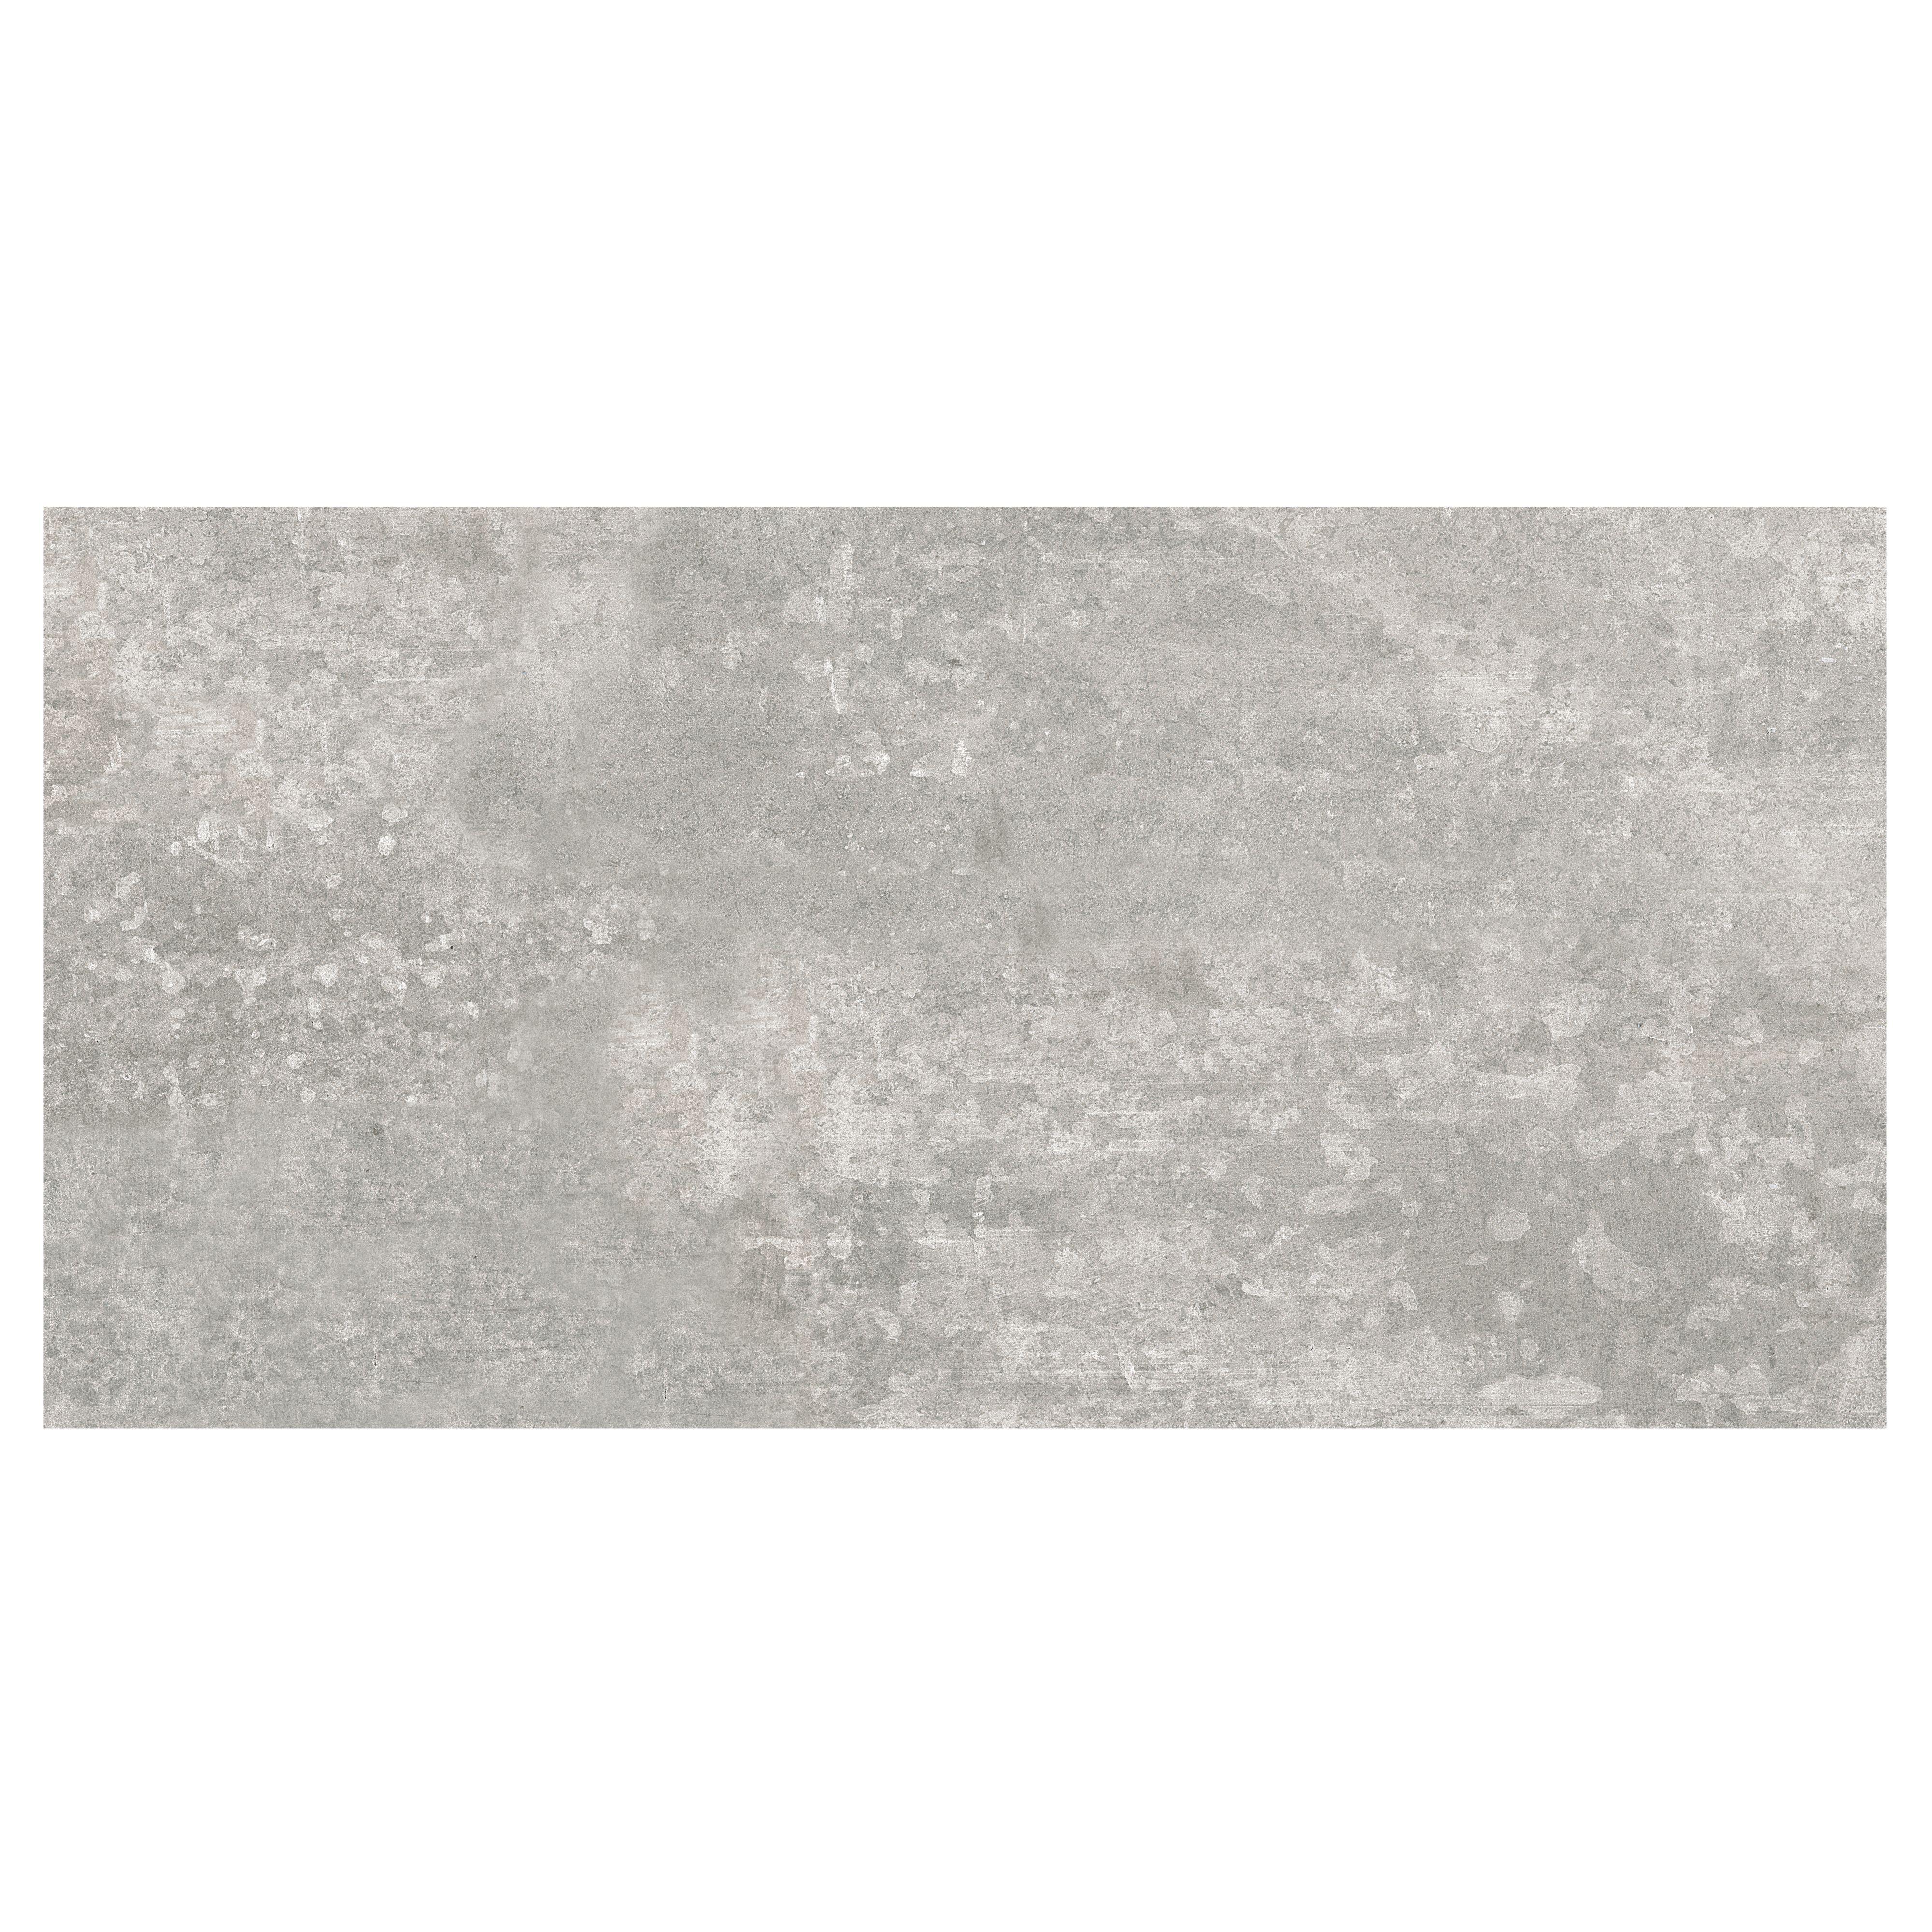 Urban grey matt ceramic wall floor tile pack of 5 l600mm w urban grey matt ceramic wall floor tile pack of 5 l600mm w300mm departments diy at bq dailygadgetfo Choice Image